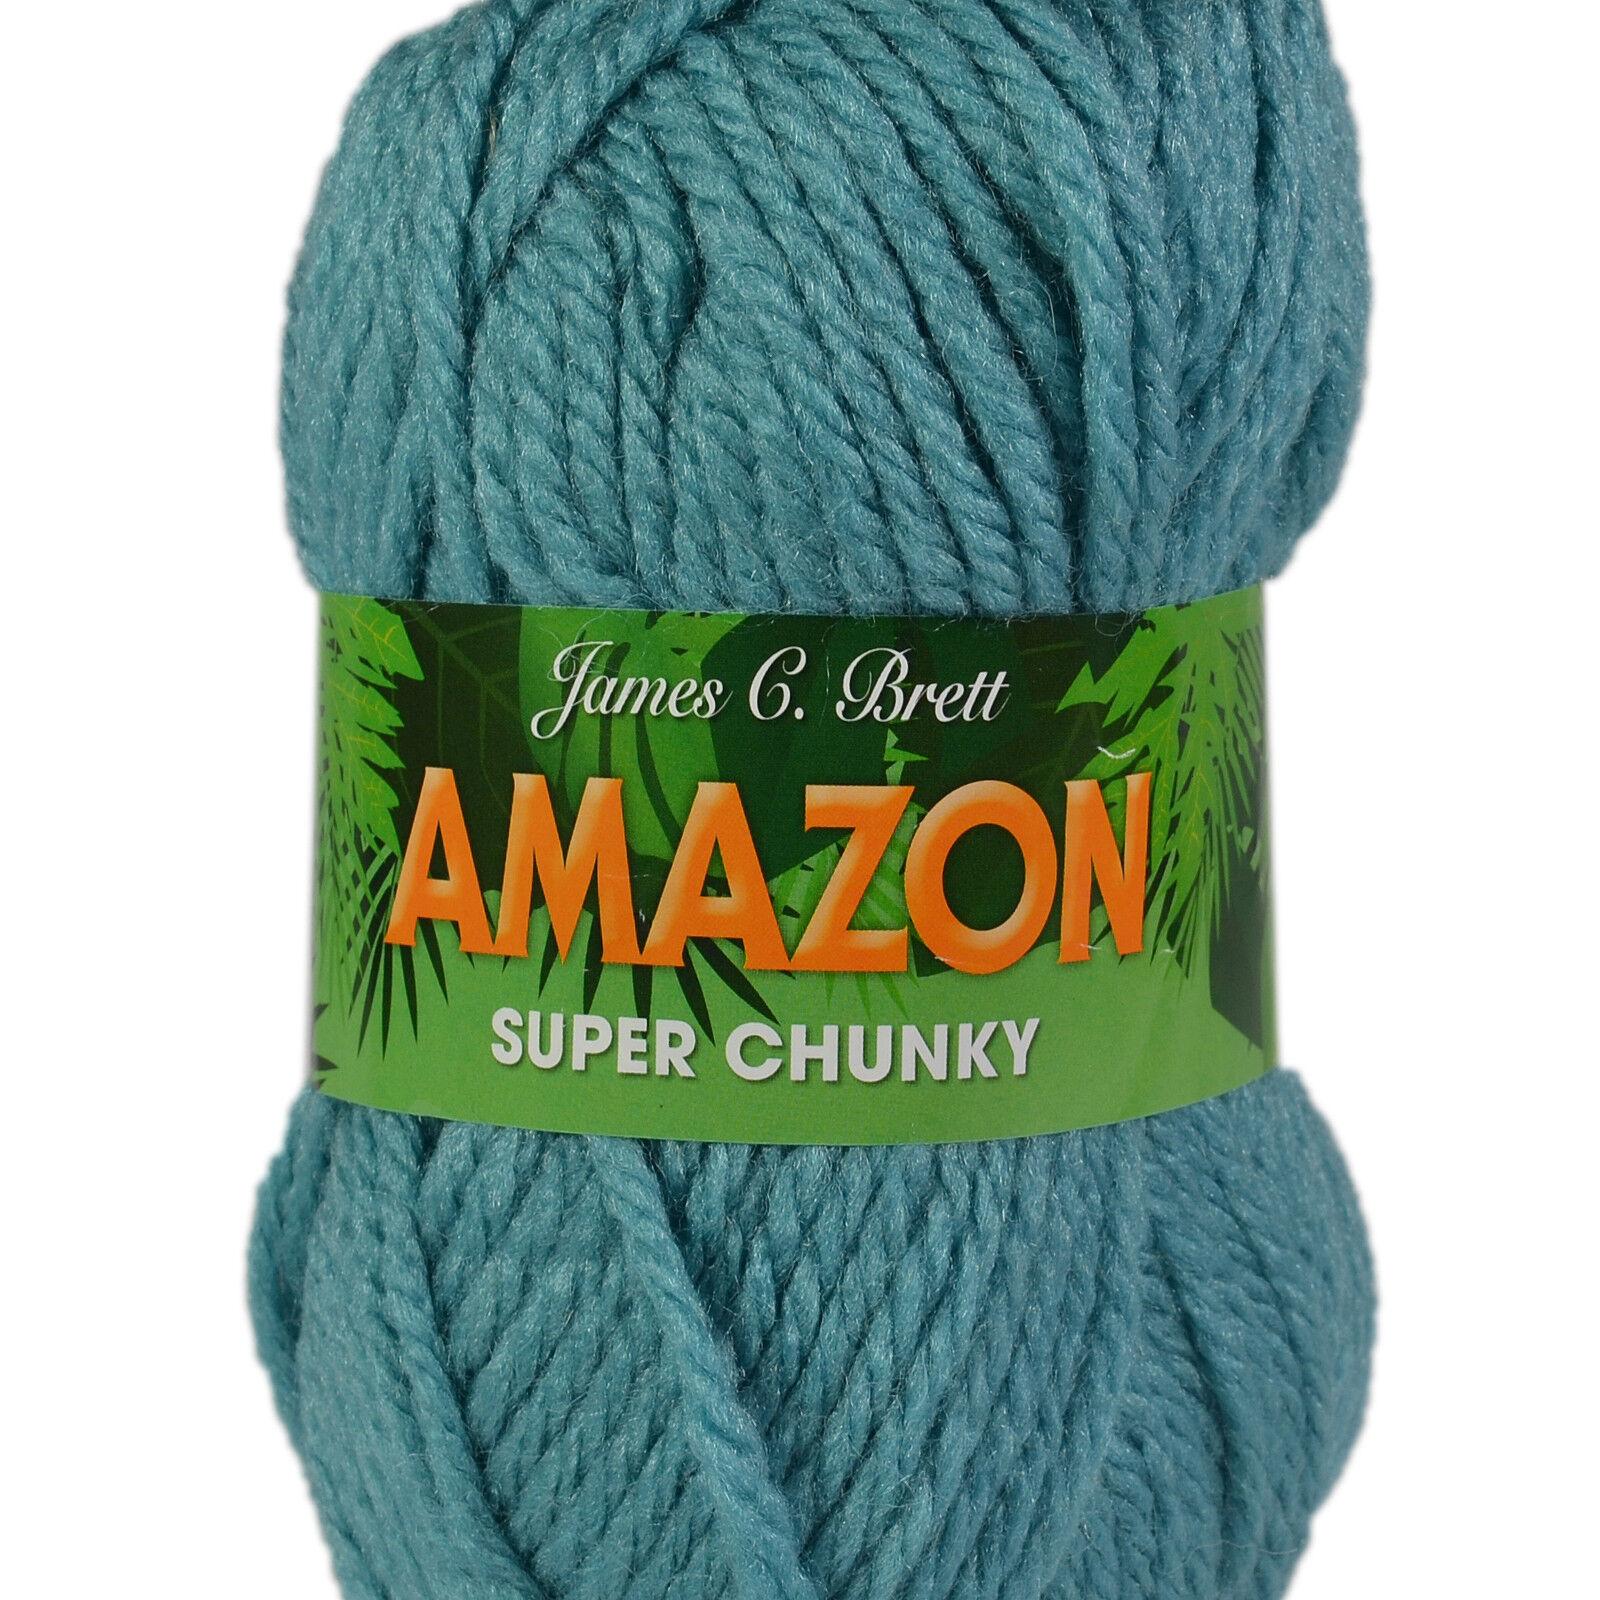 James C Brett Amazon Super Chunky 100g Wool Yarn J11 Dk Grey